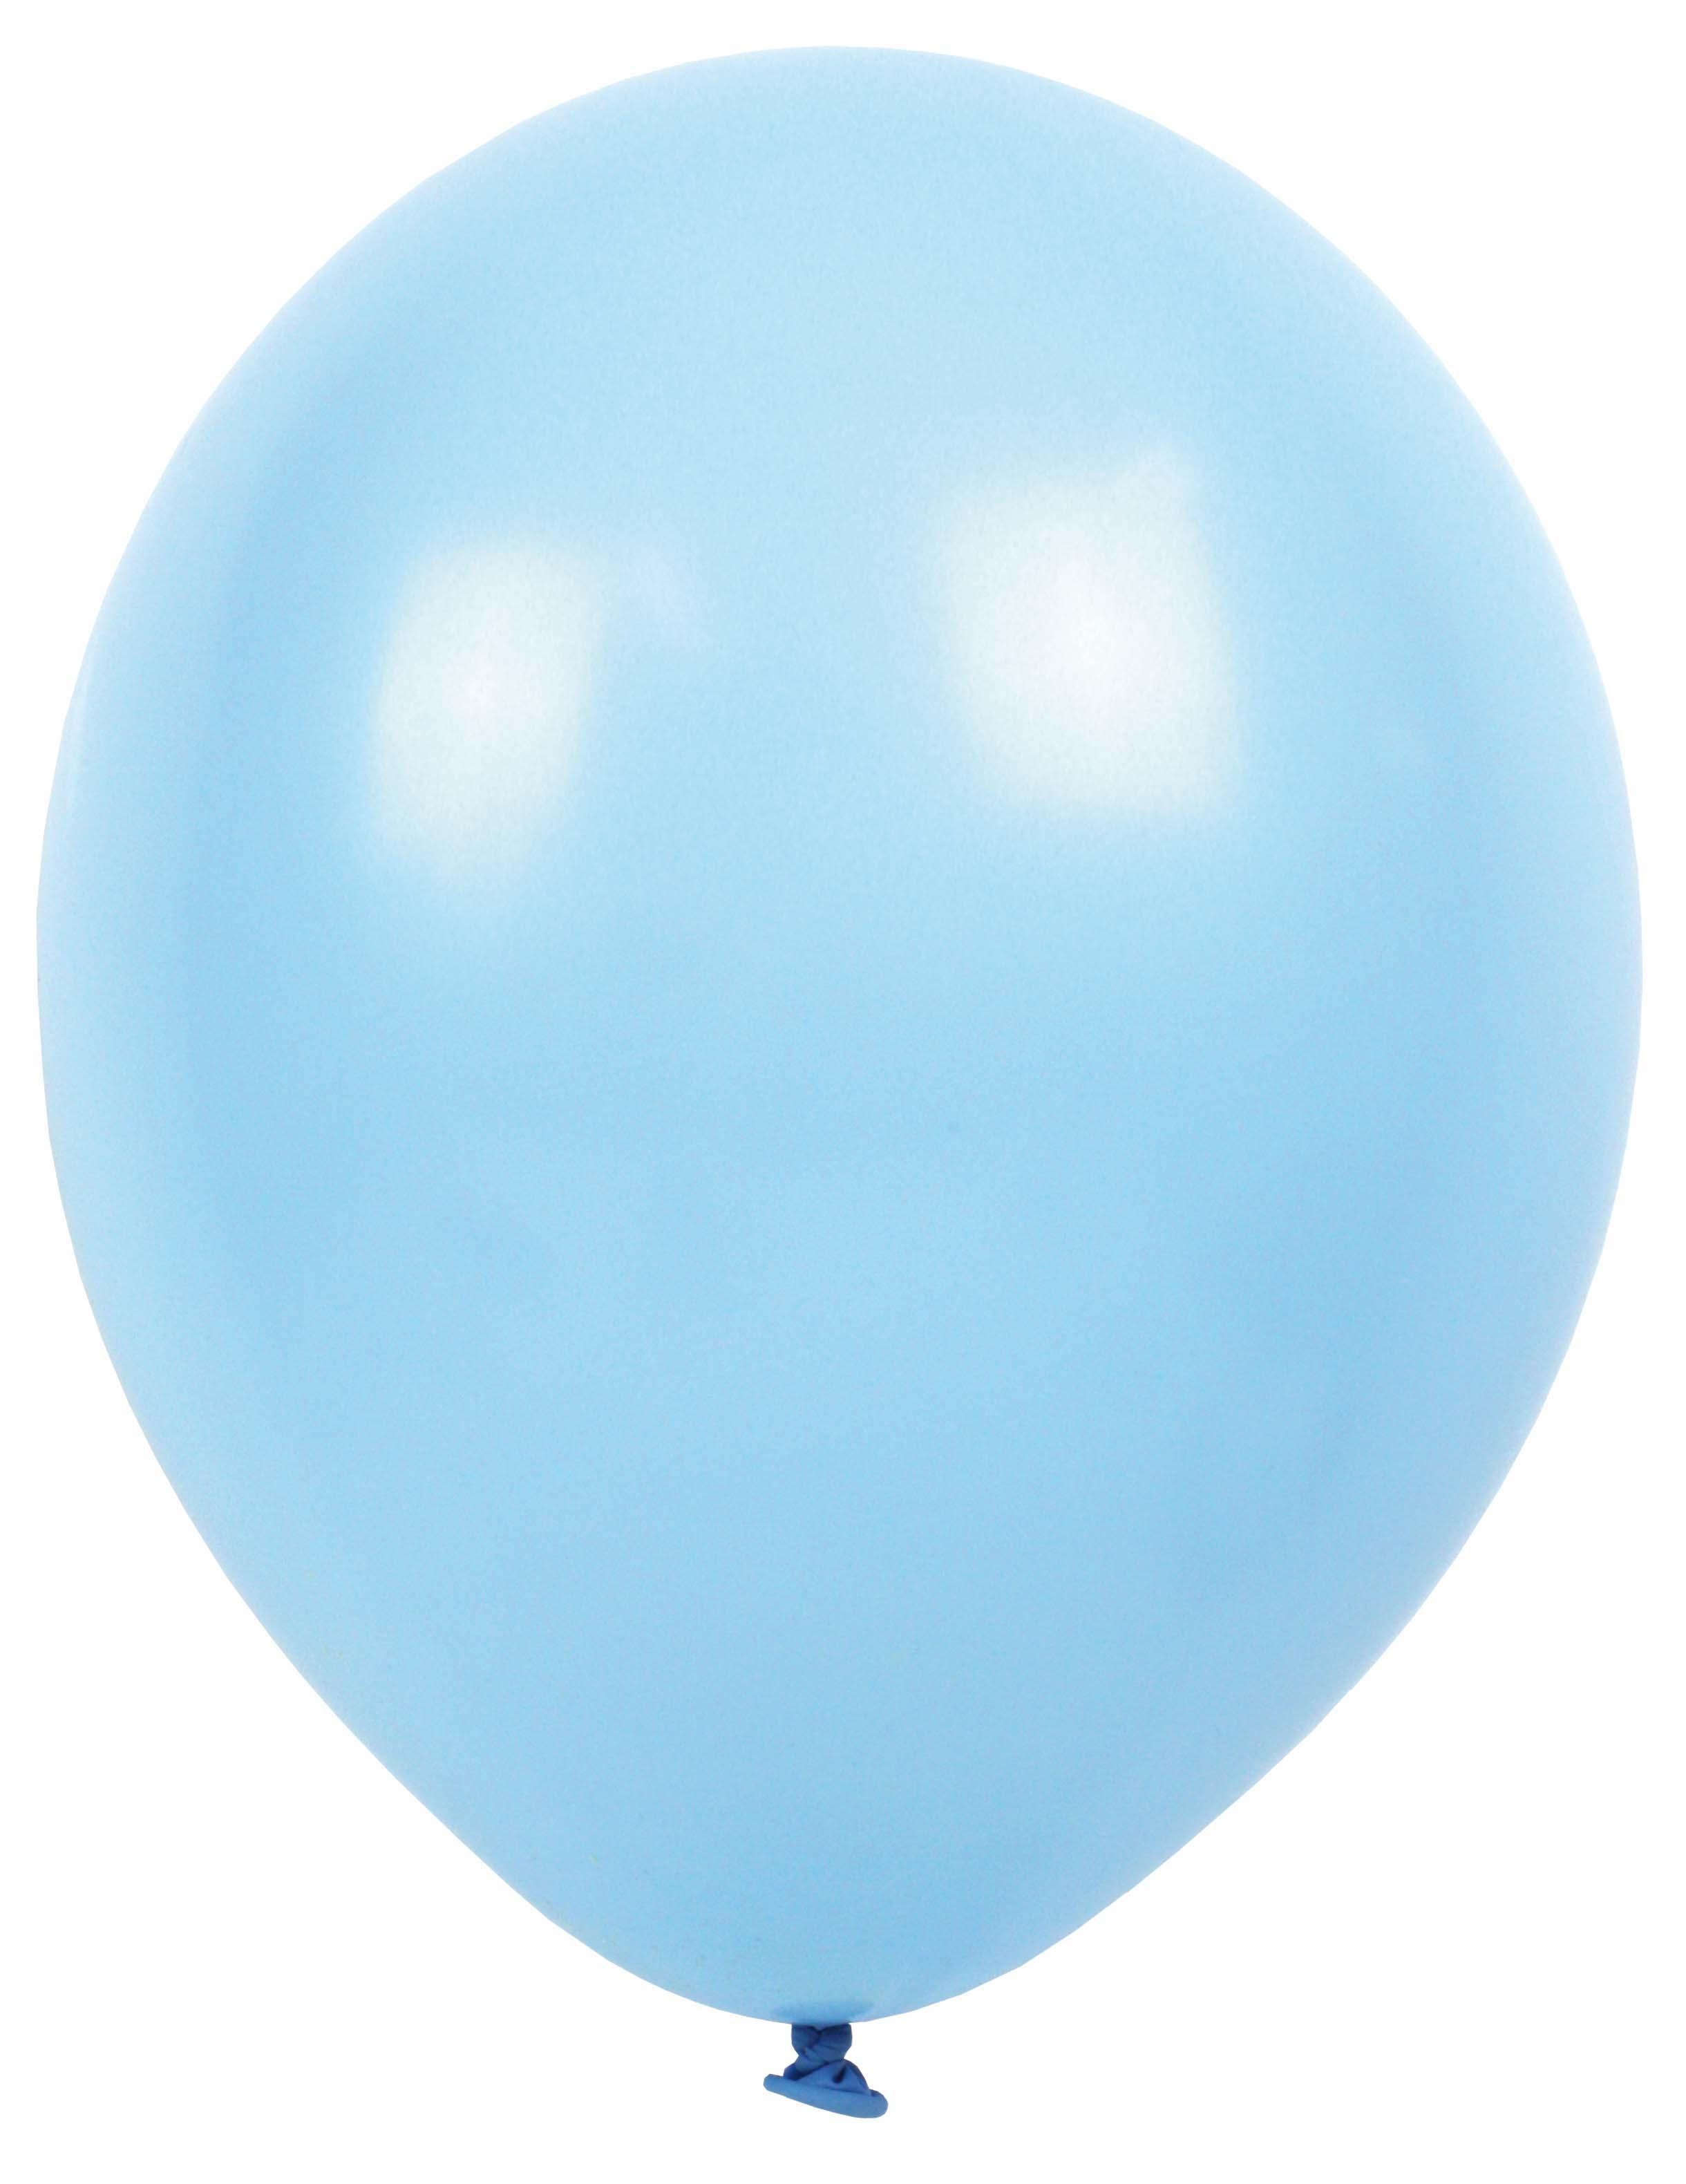 Luftballons blau grau weiß